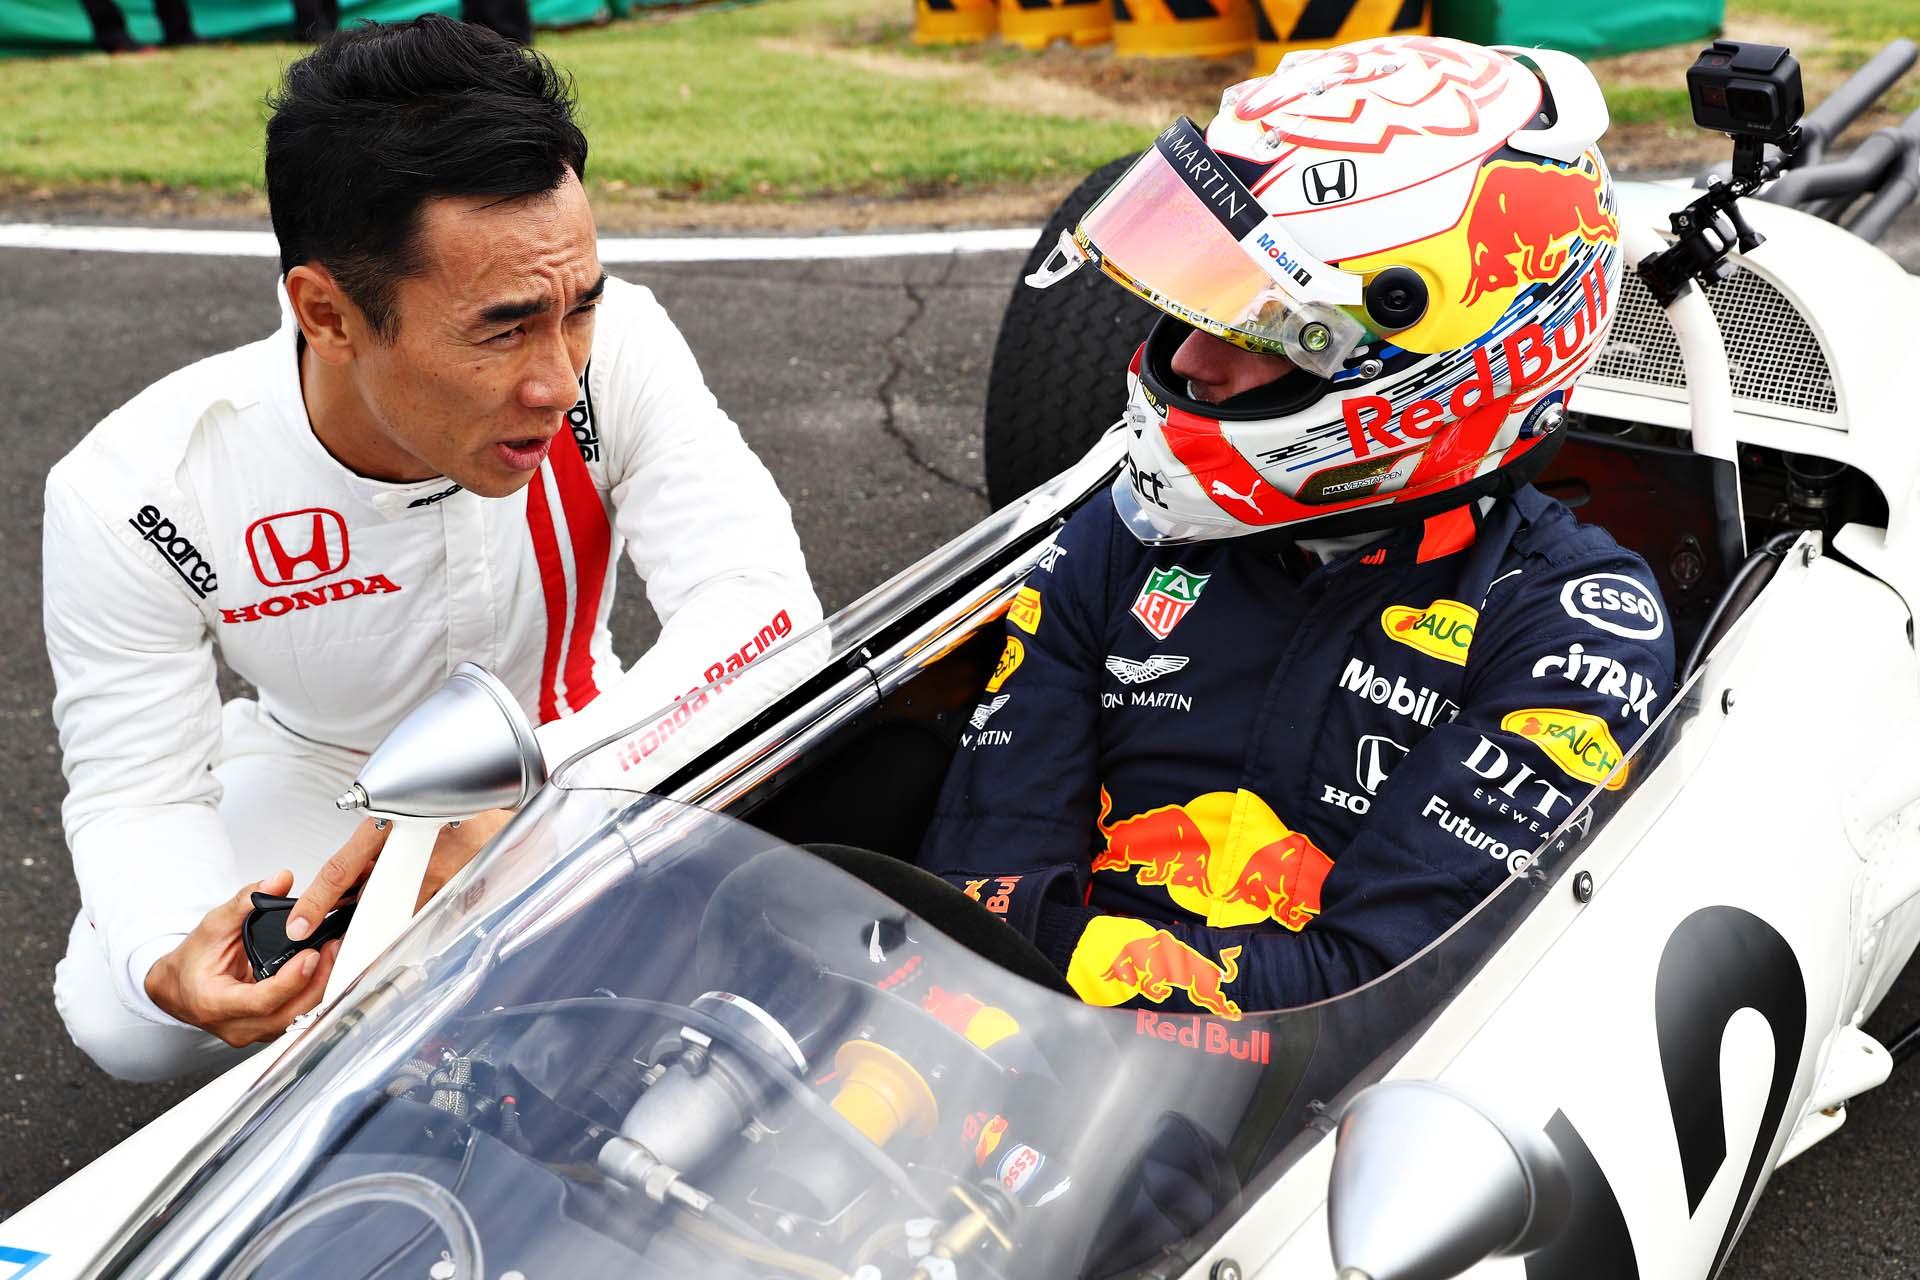 F1 Grand Prix of Japan - Previews